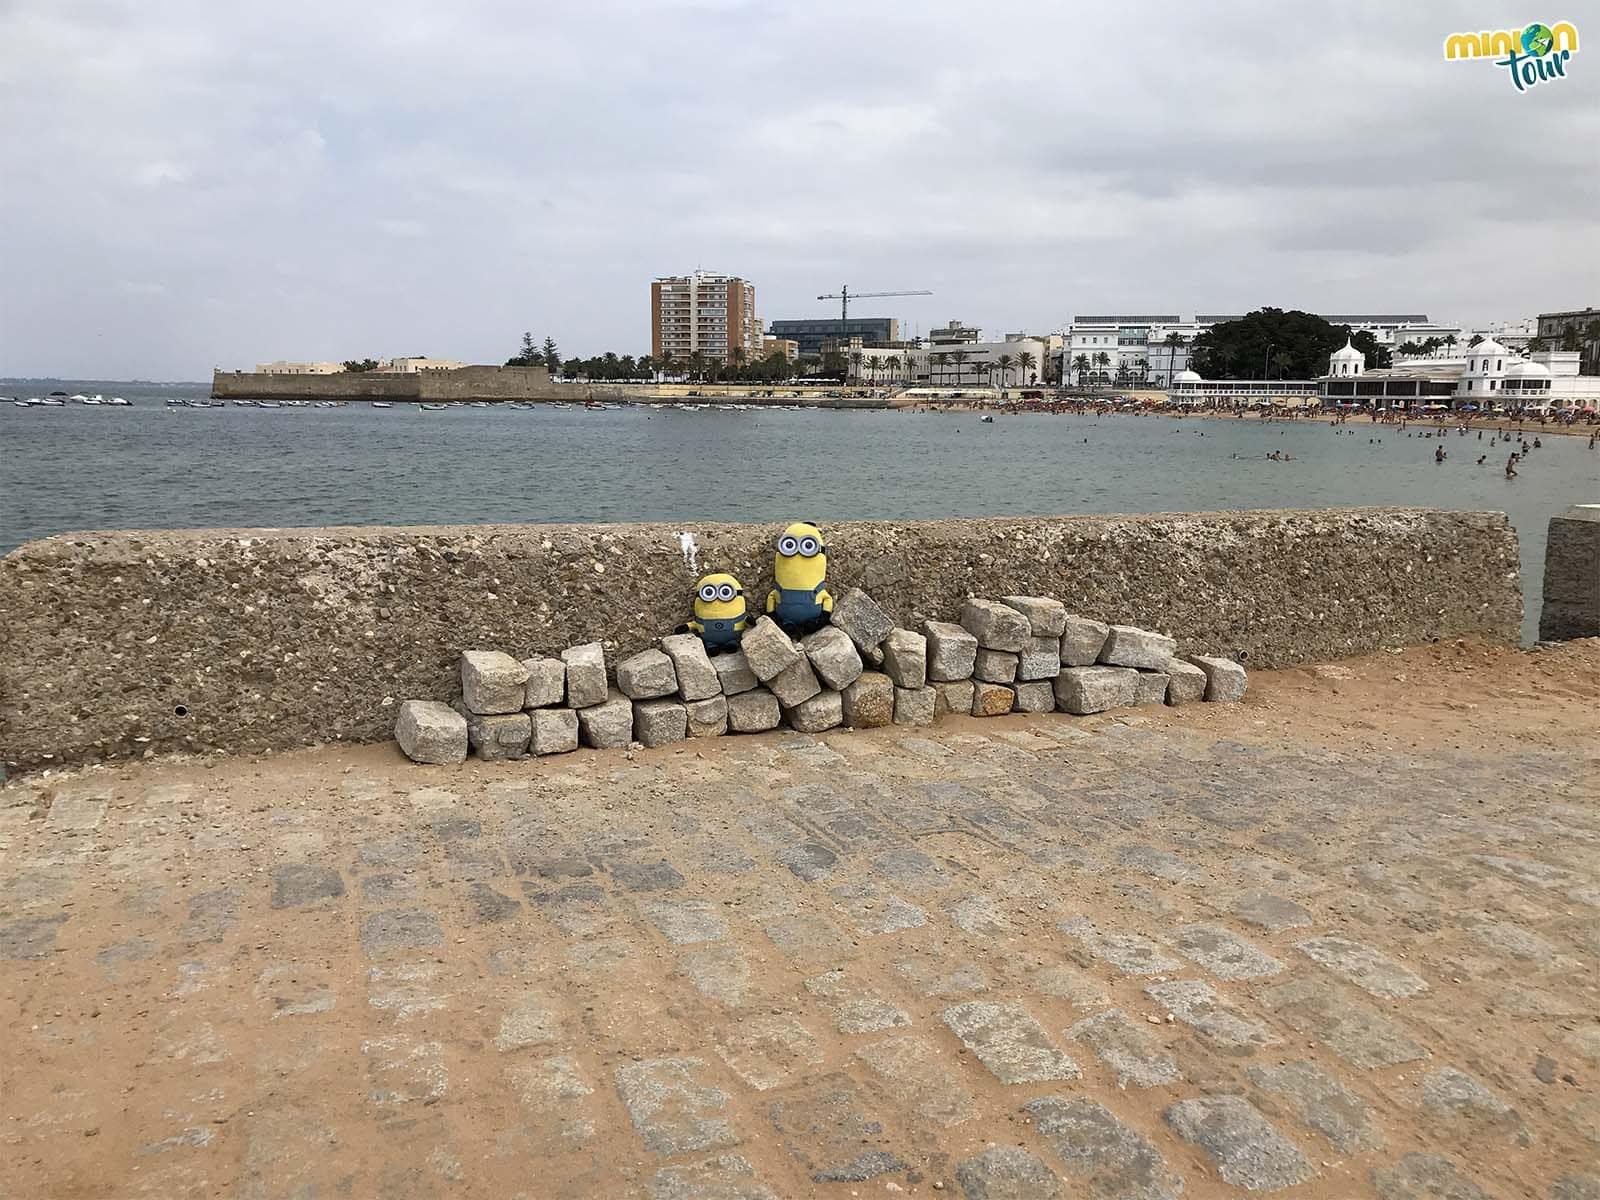 Los Minions con Cádiz al fondo